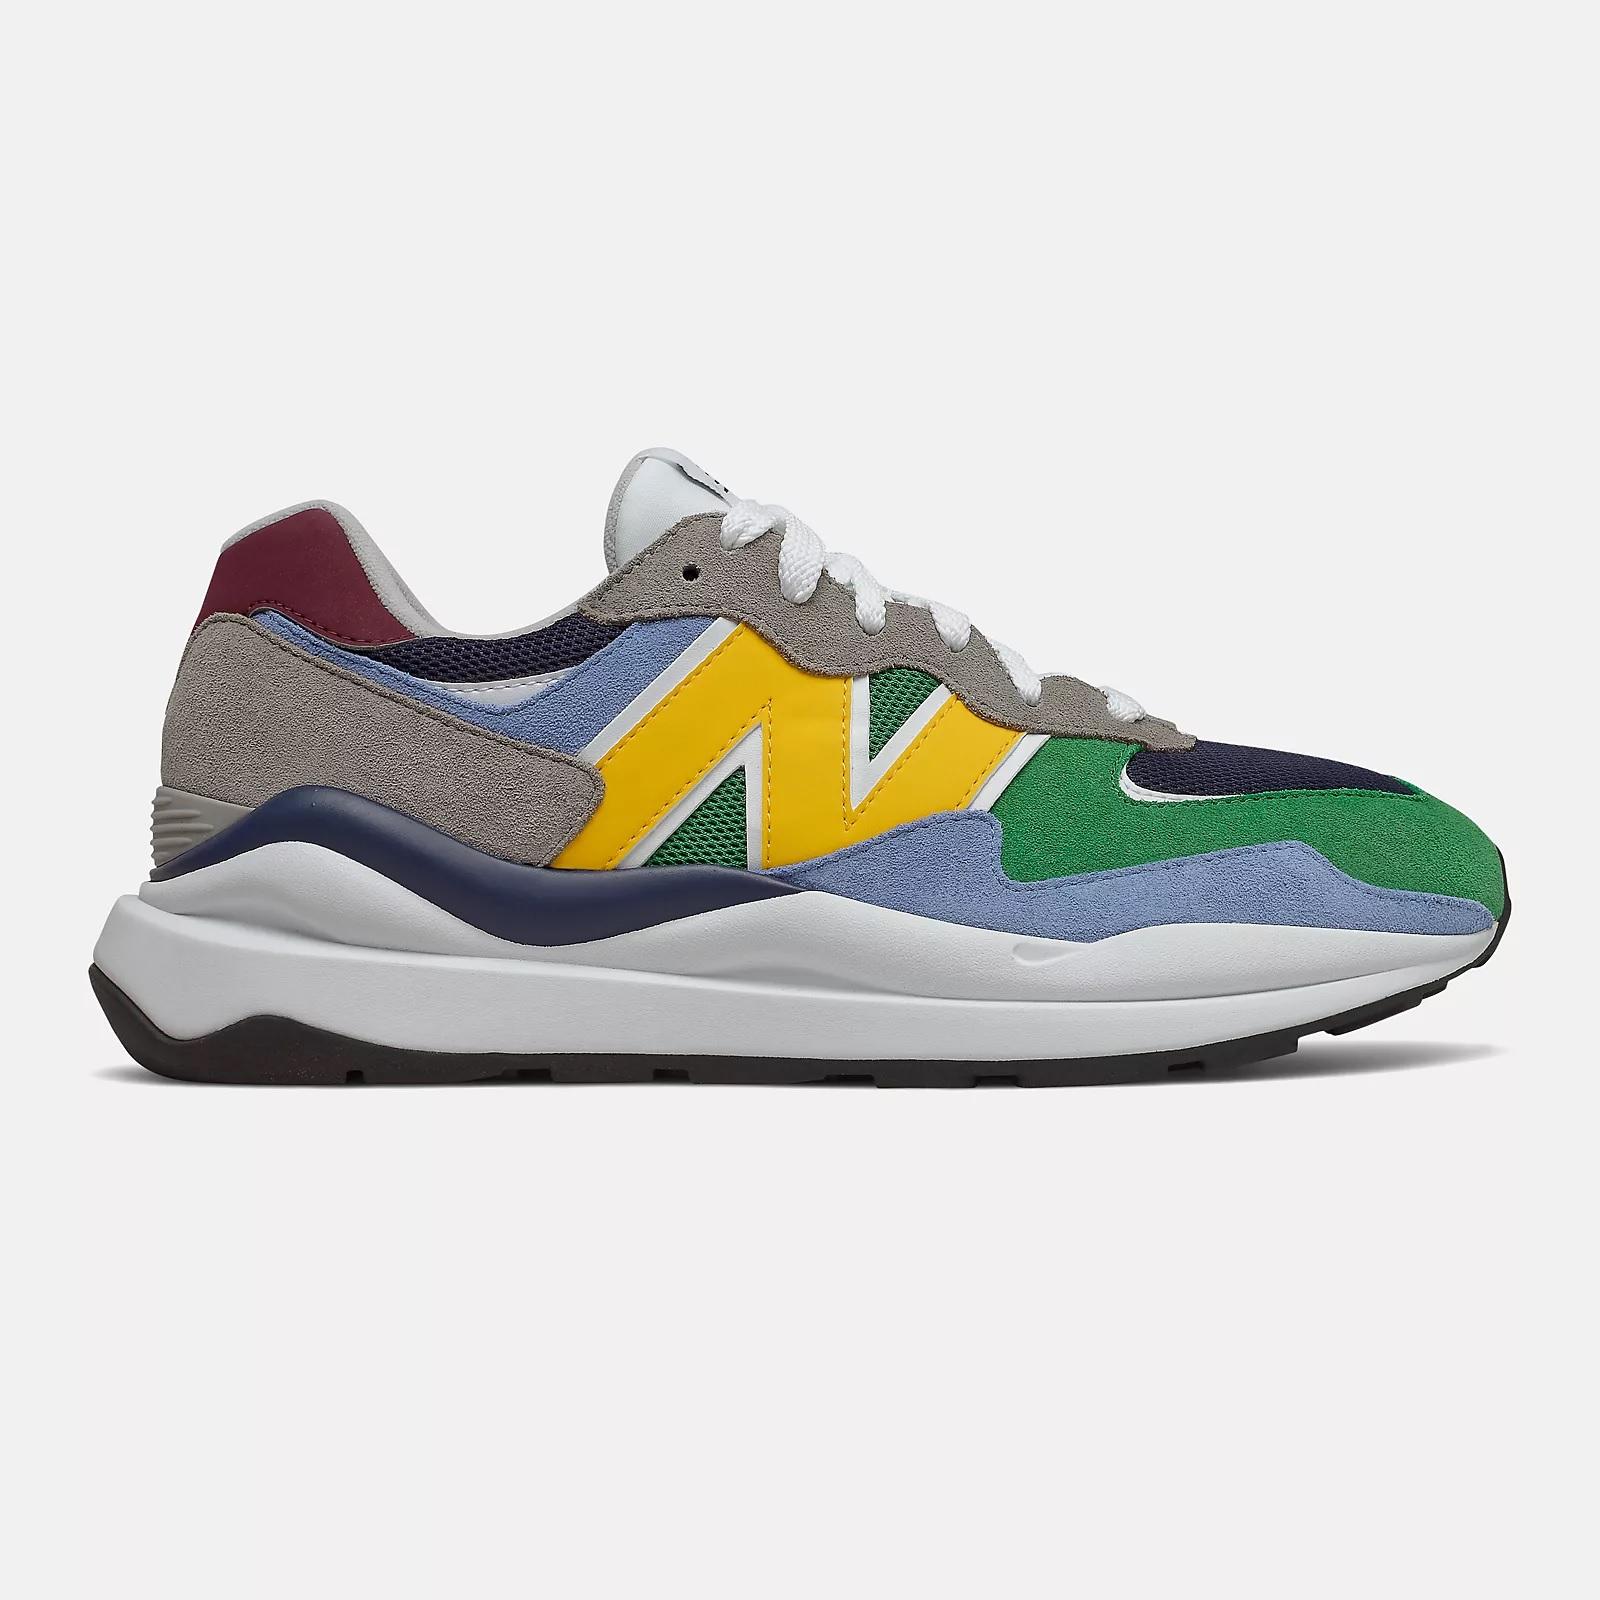 New Balance 57/40 DAHOOD 'Yellow Green'